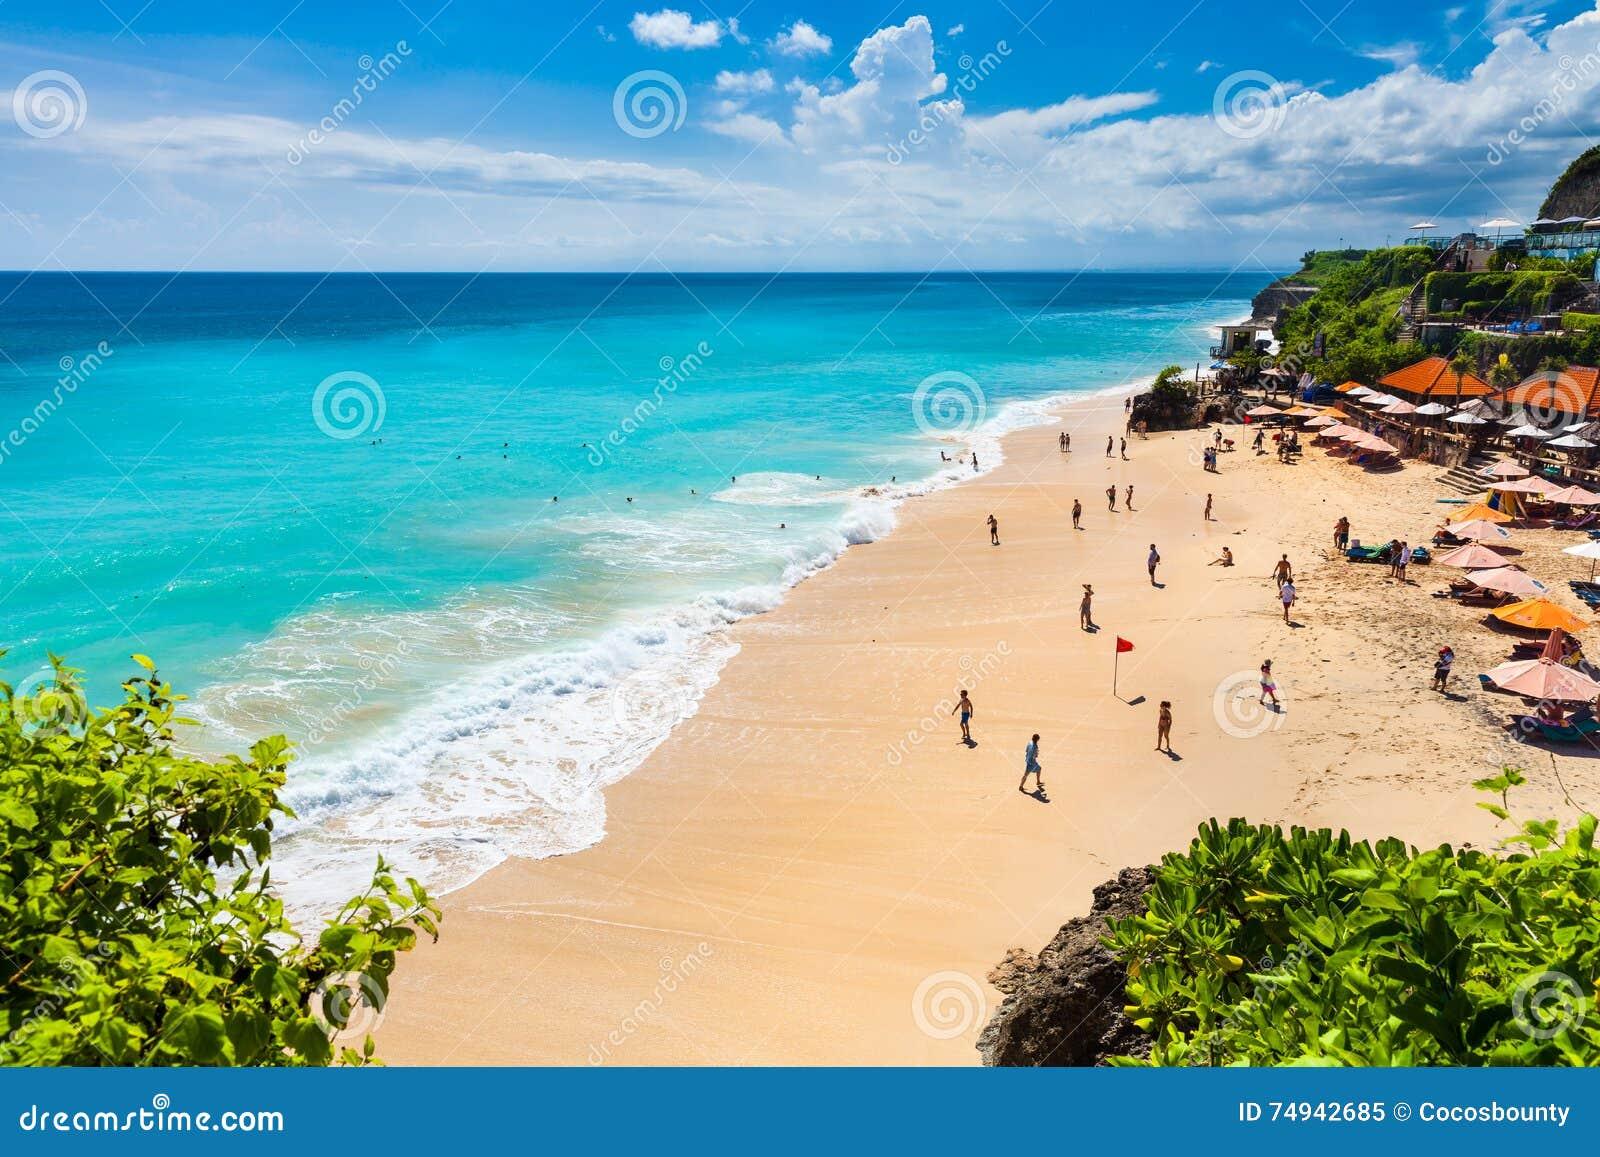 Dreamland Beach Bali Island